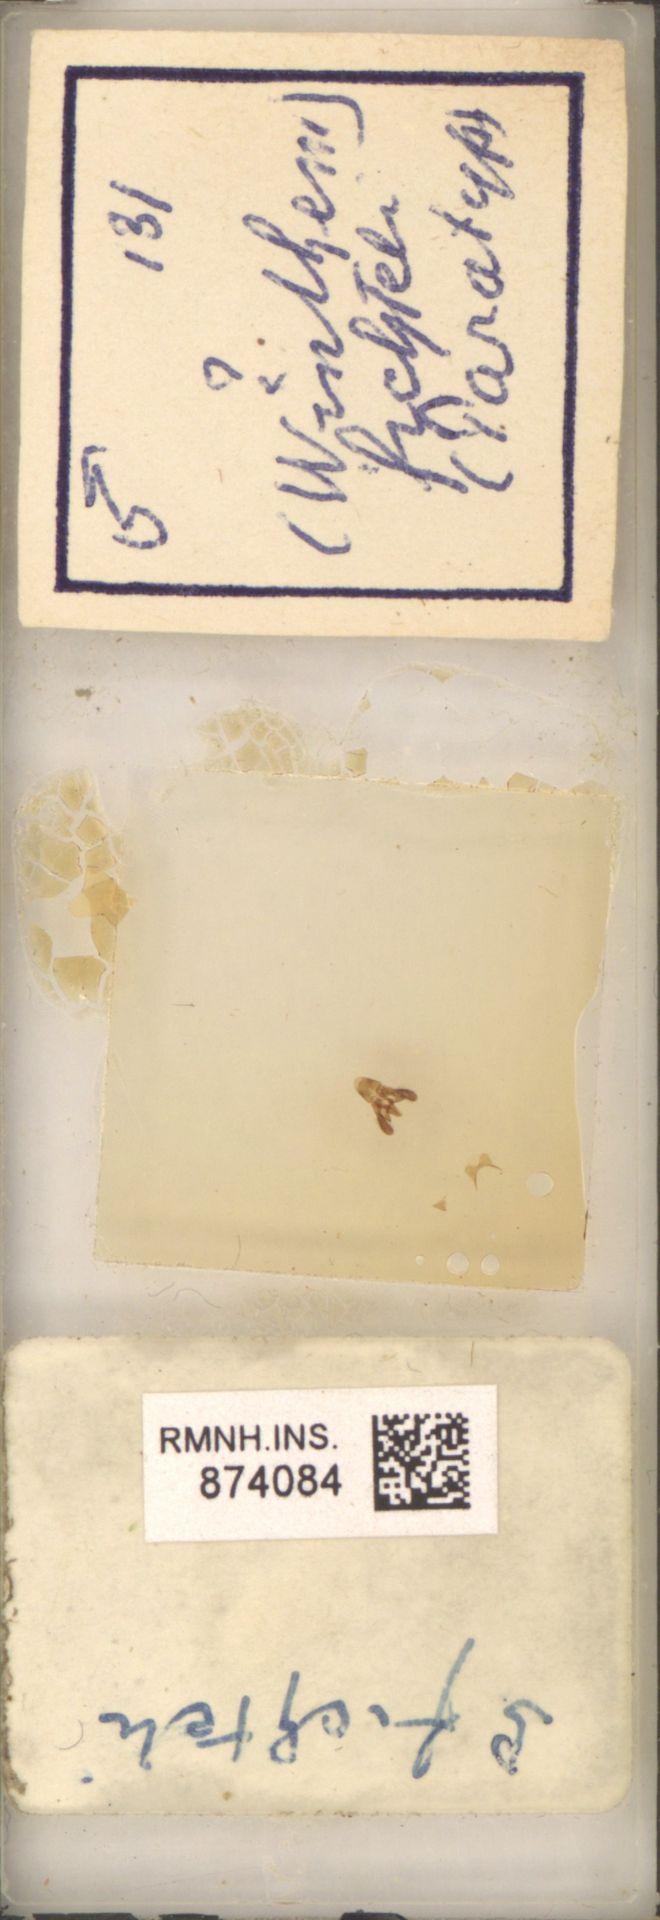 RMNH.INS.874084 | (Wintheni) fichteli